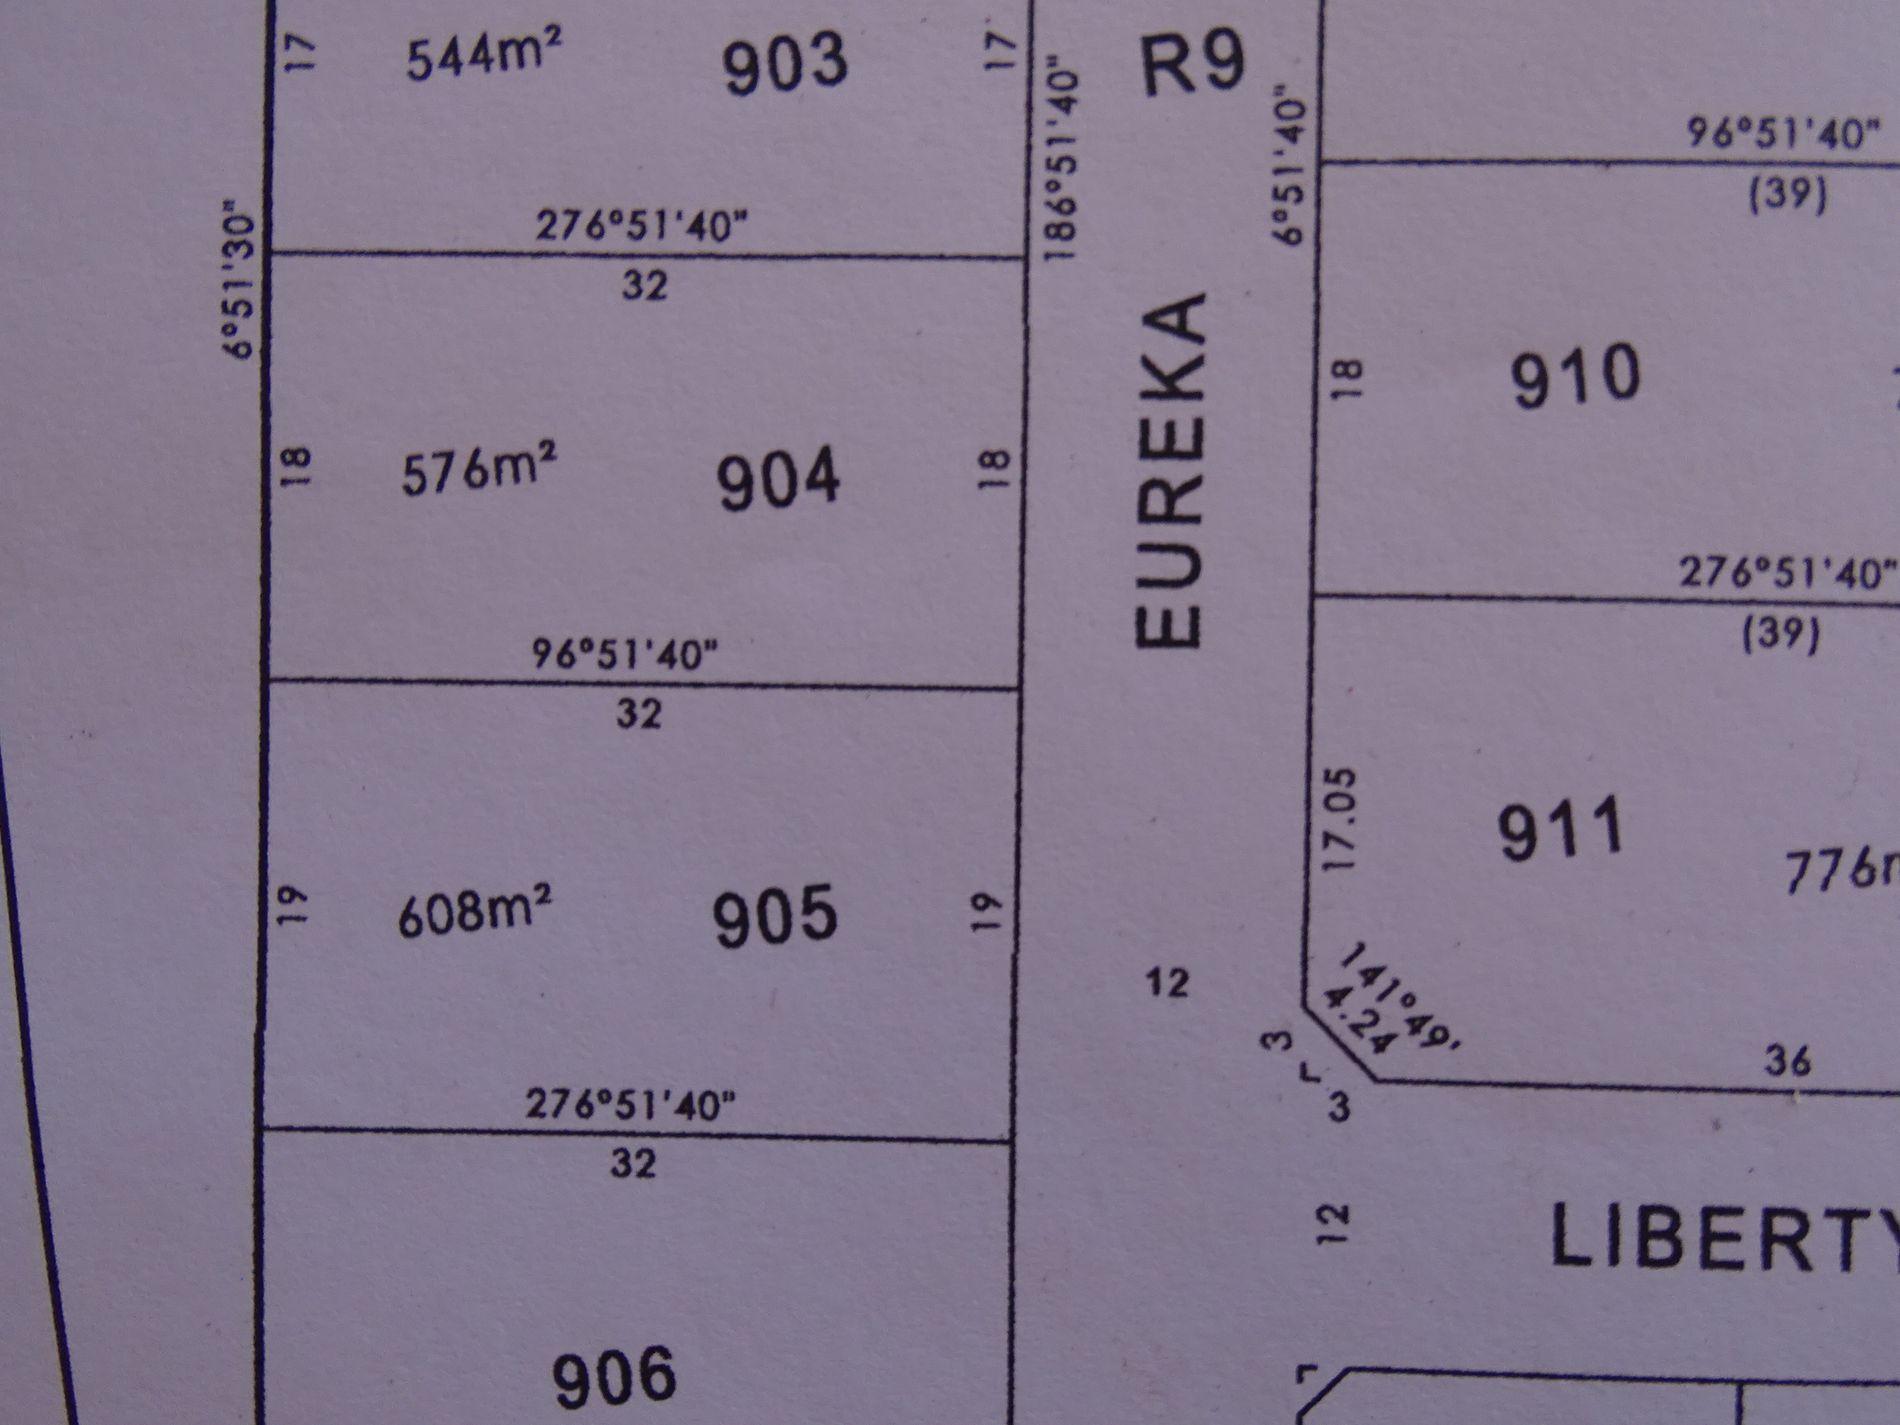 Lot 904, 16 Eureka Drive, Nagambie